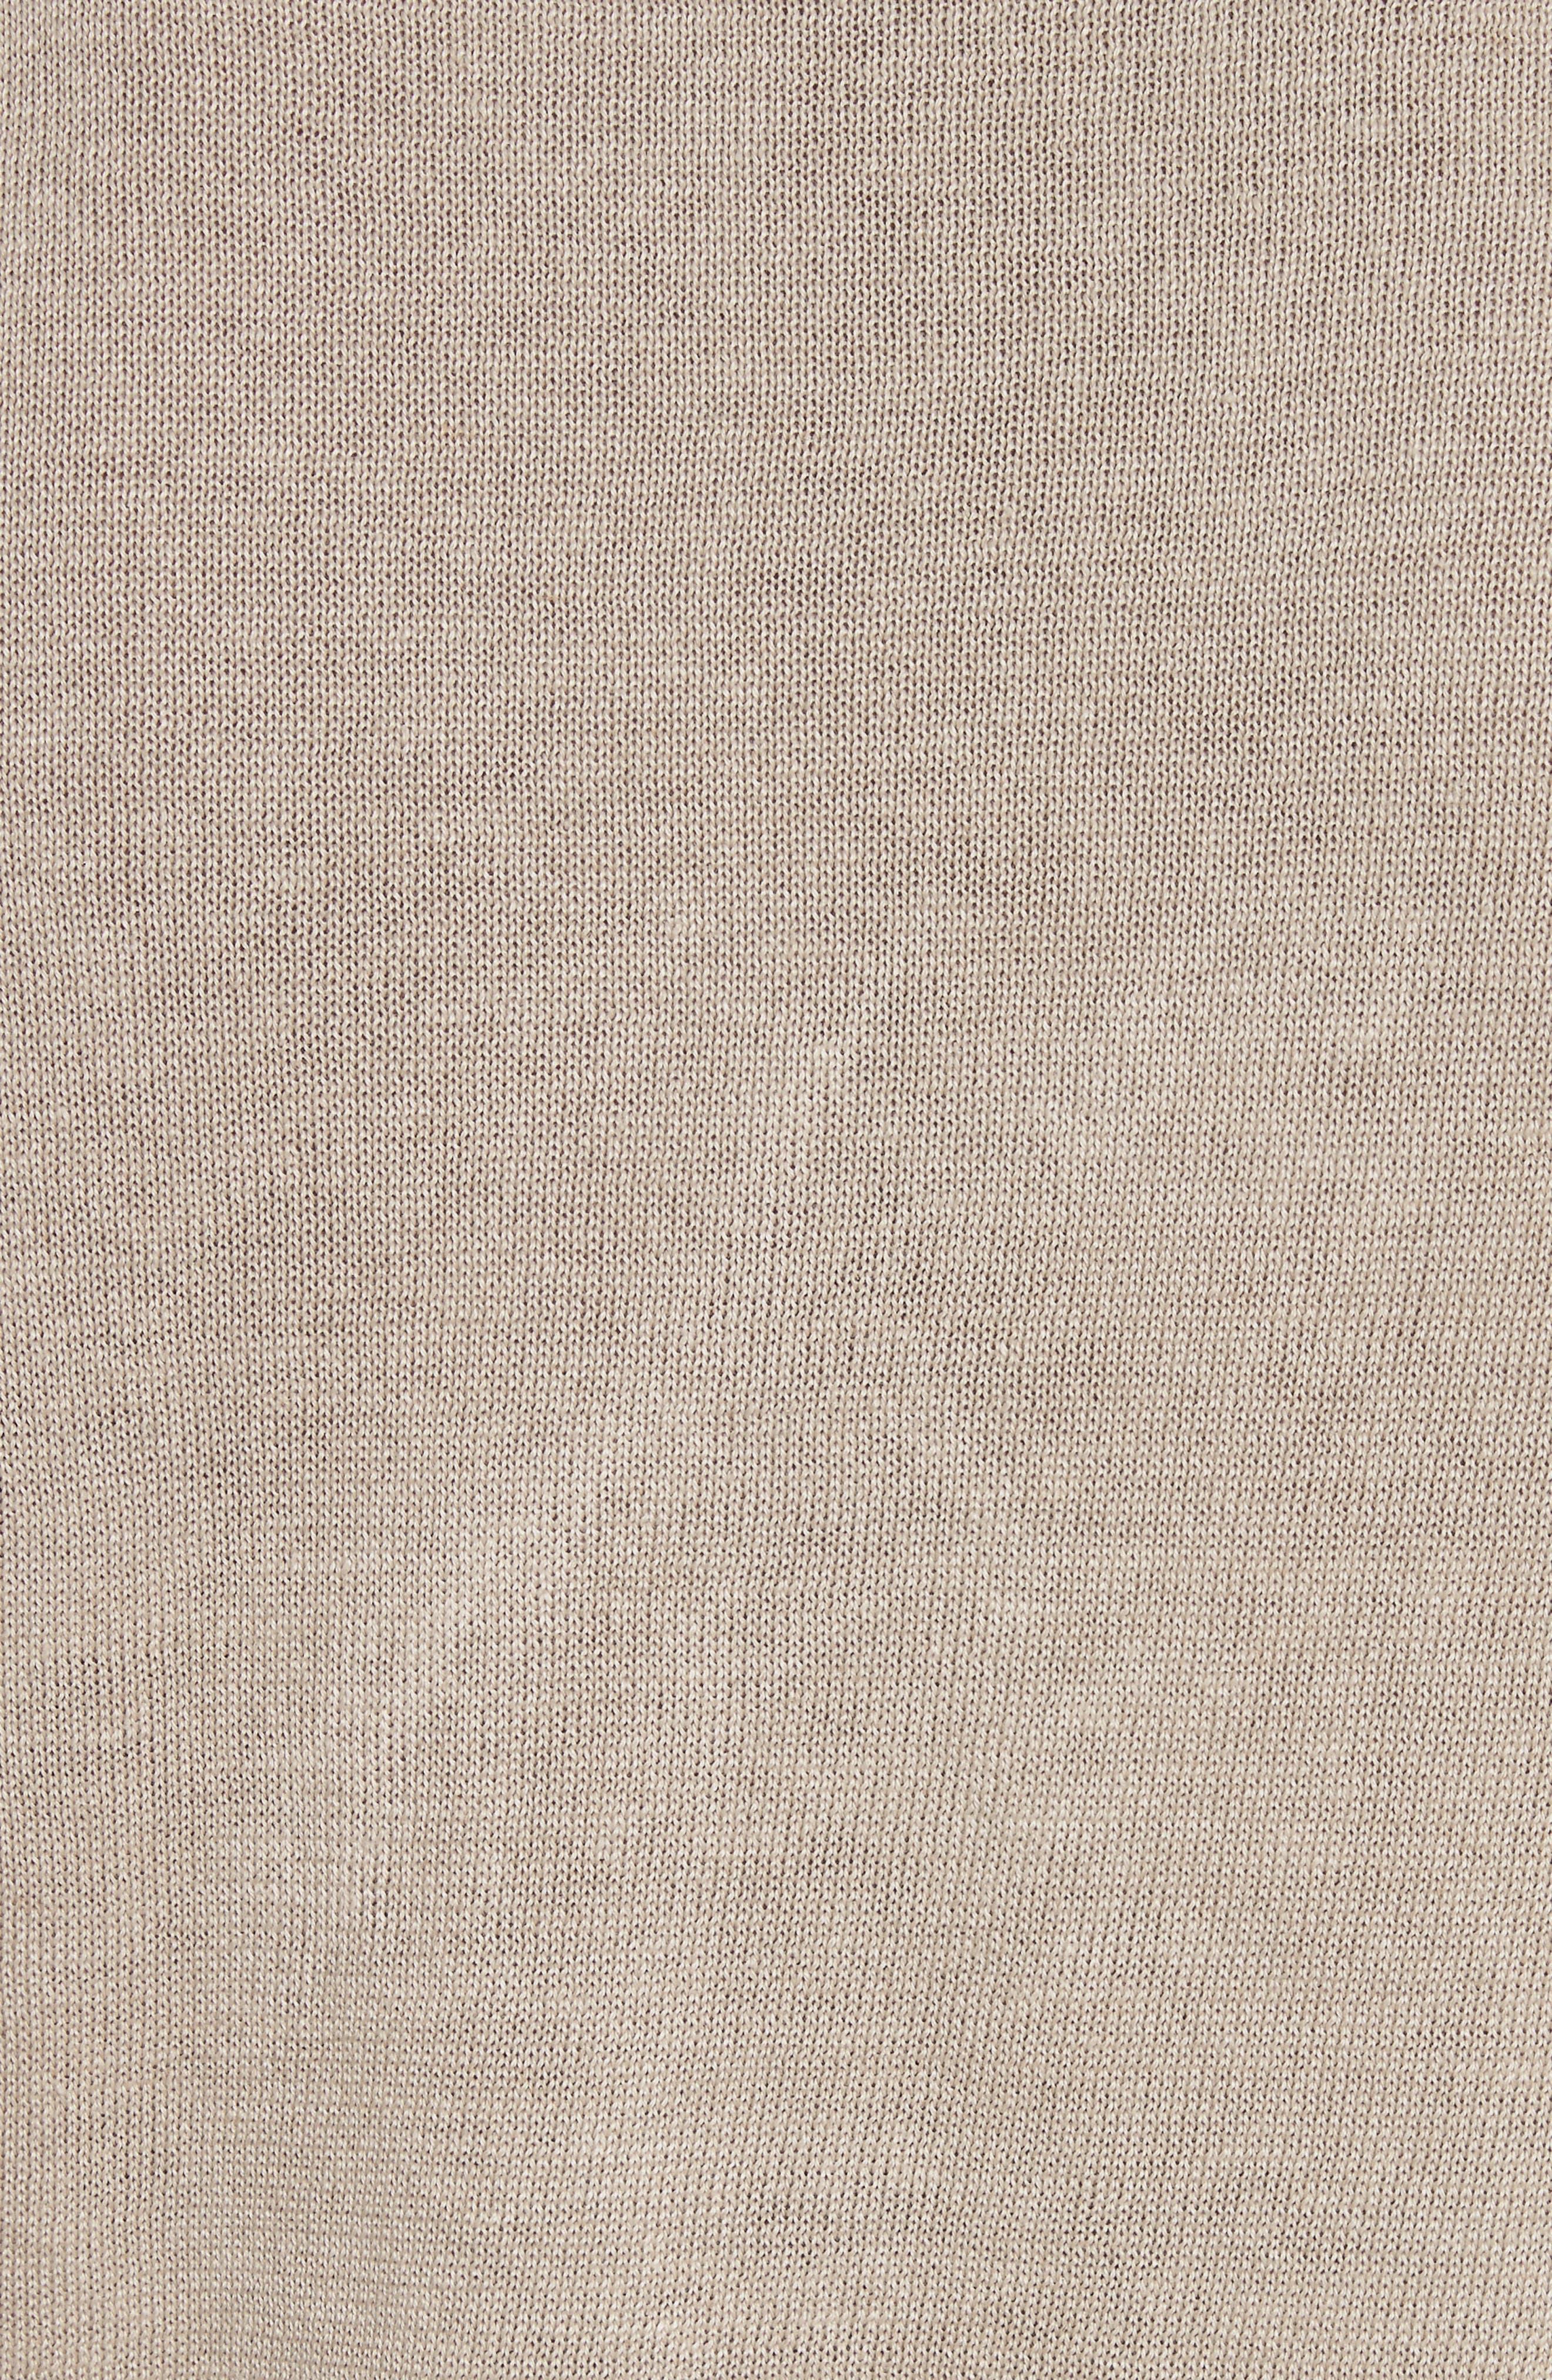 Exford Linen Crewneck Sweater,                             Alternate thumbnail 5, color,                             270